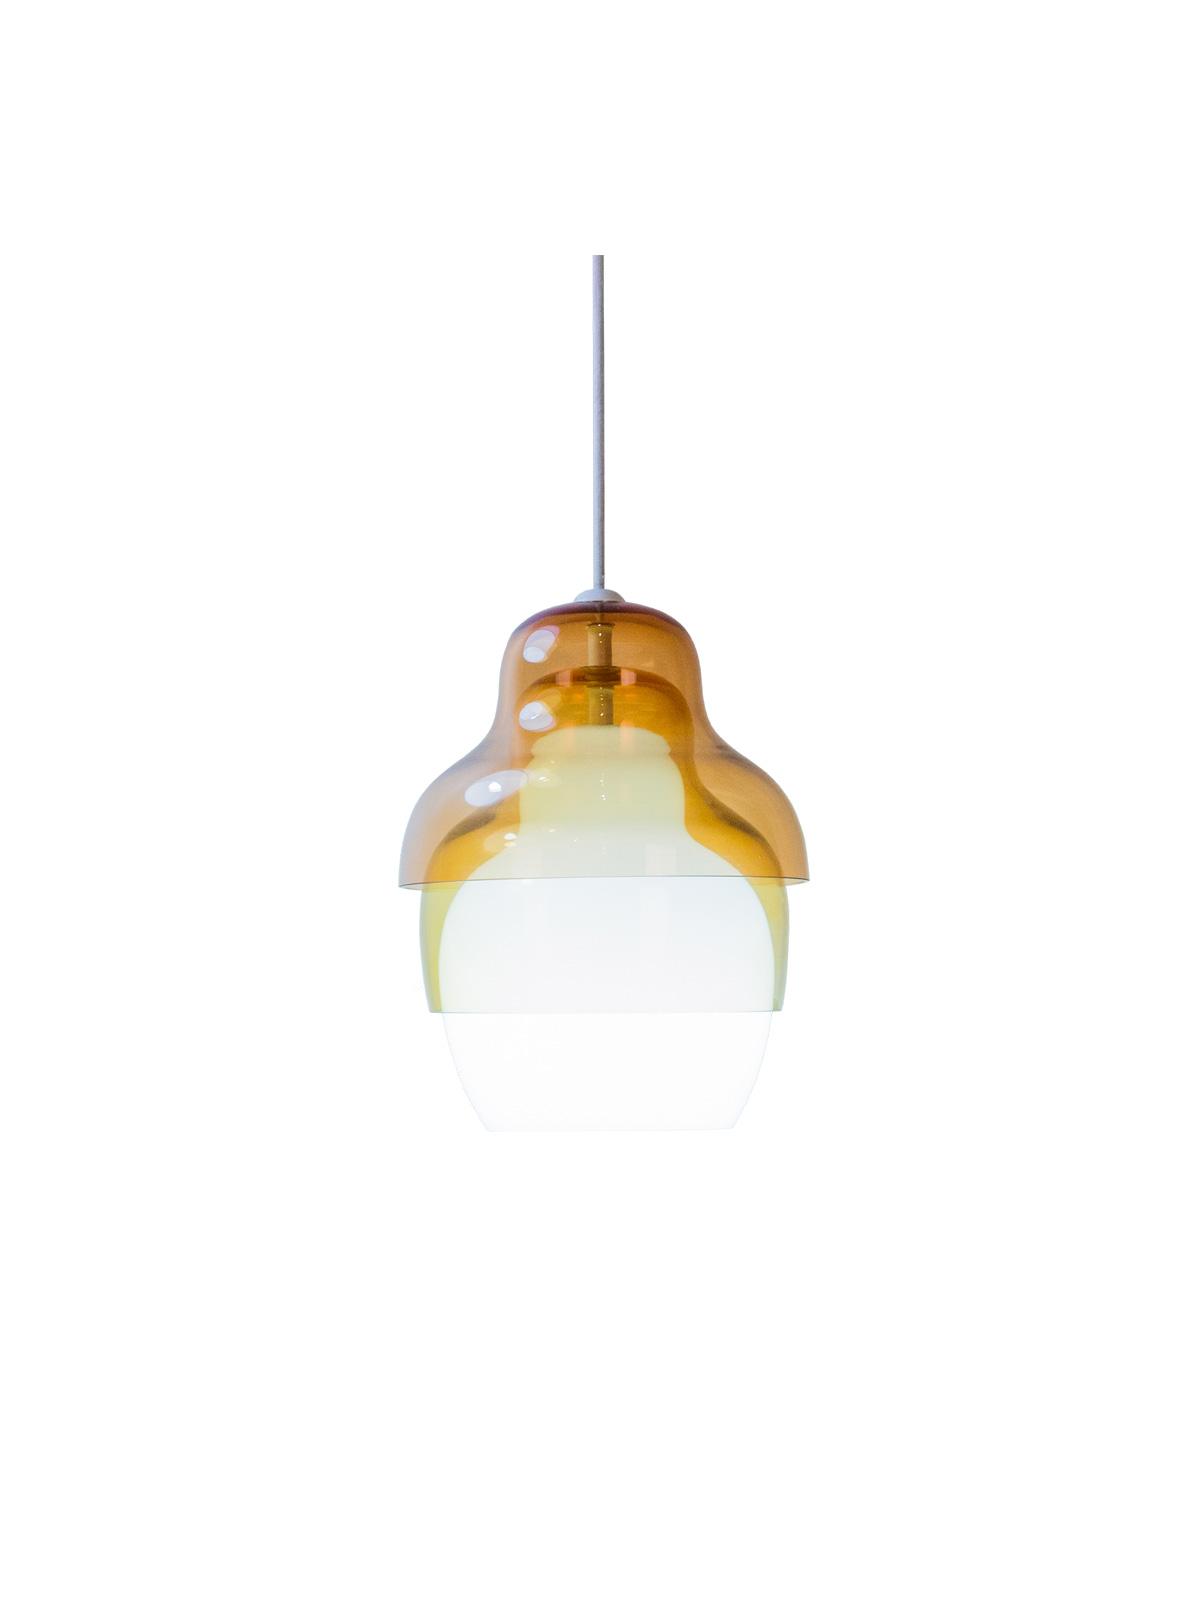 Pendelleuchte Matrioshka Innermost Lampe